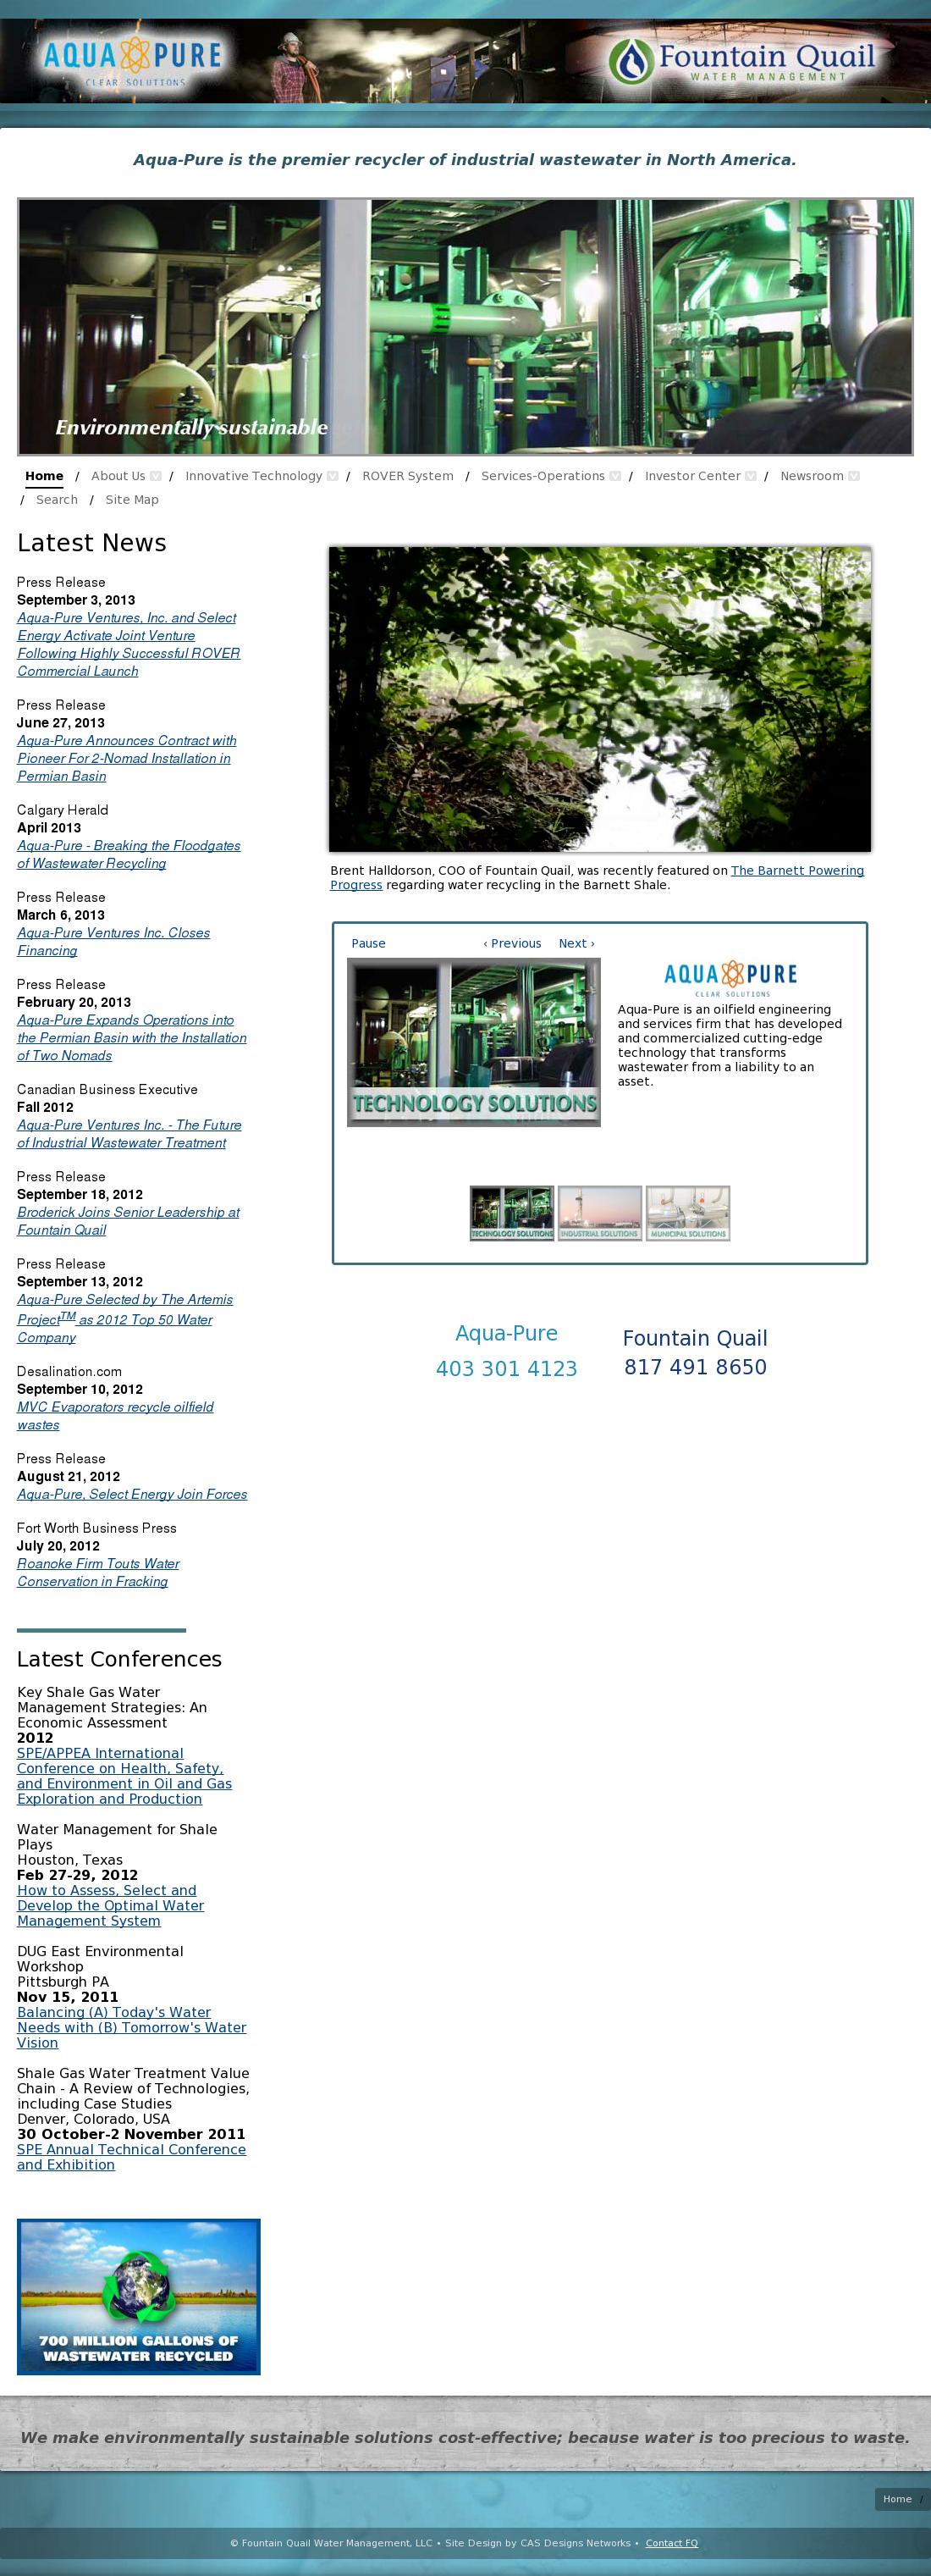 Aqua-Pure Competitors, Revenue and Employees - Owler Company Profile